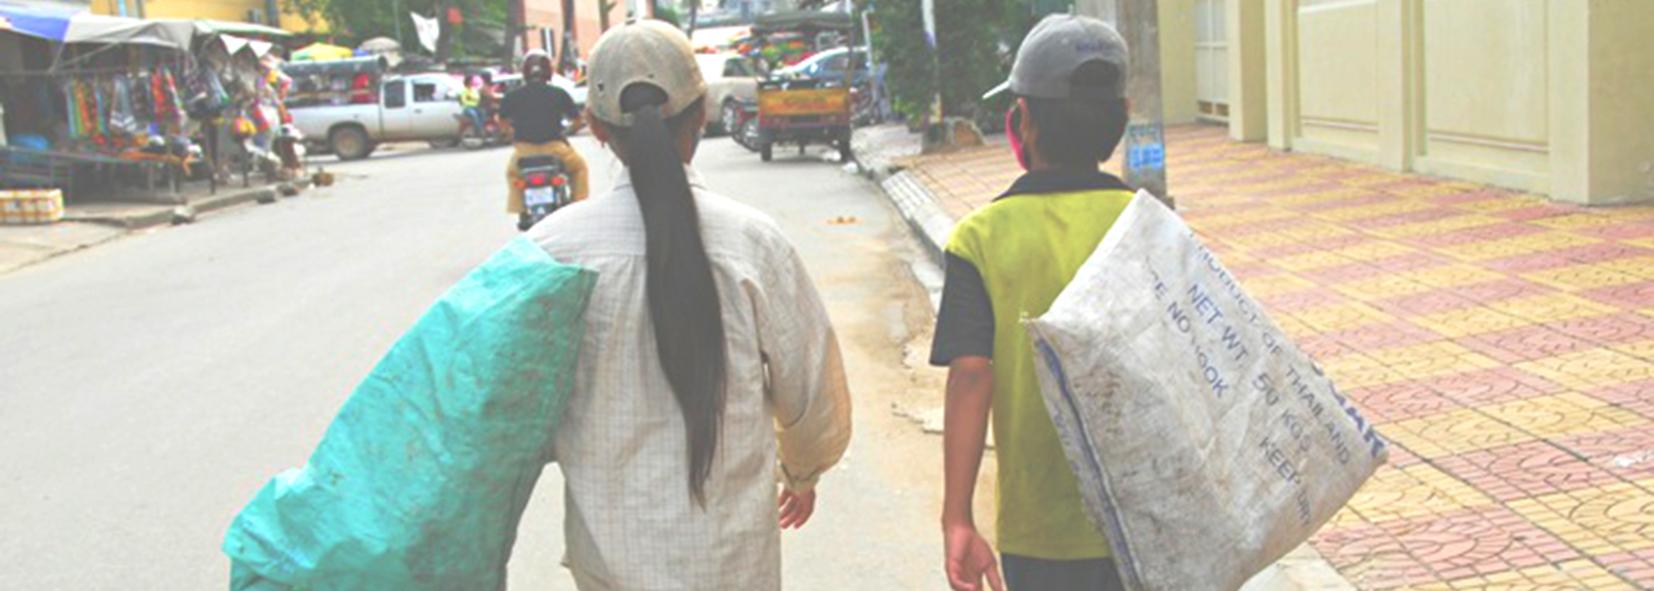 2014 FINALIST | Op-ed: Why we should treasure Cambodia's girl trash collectors